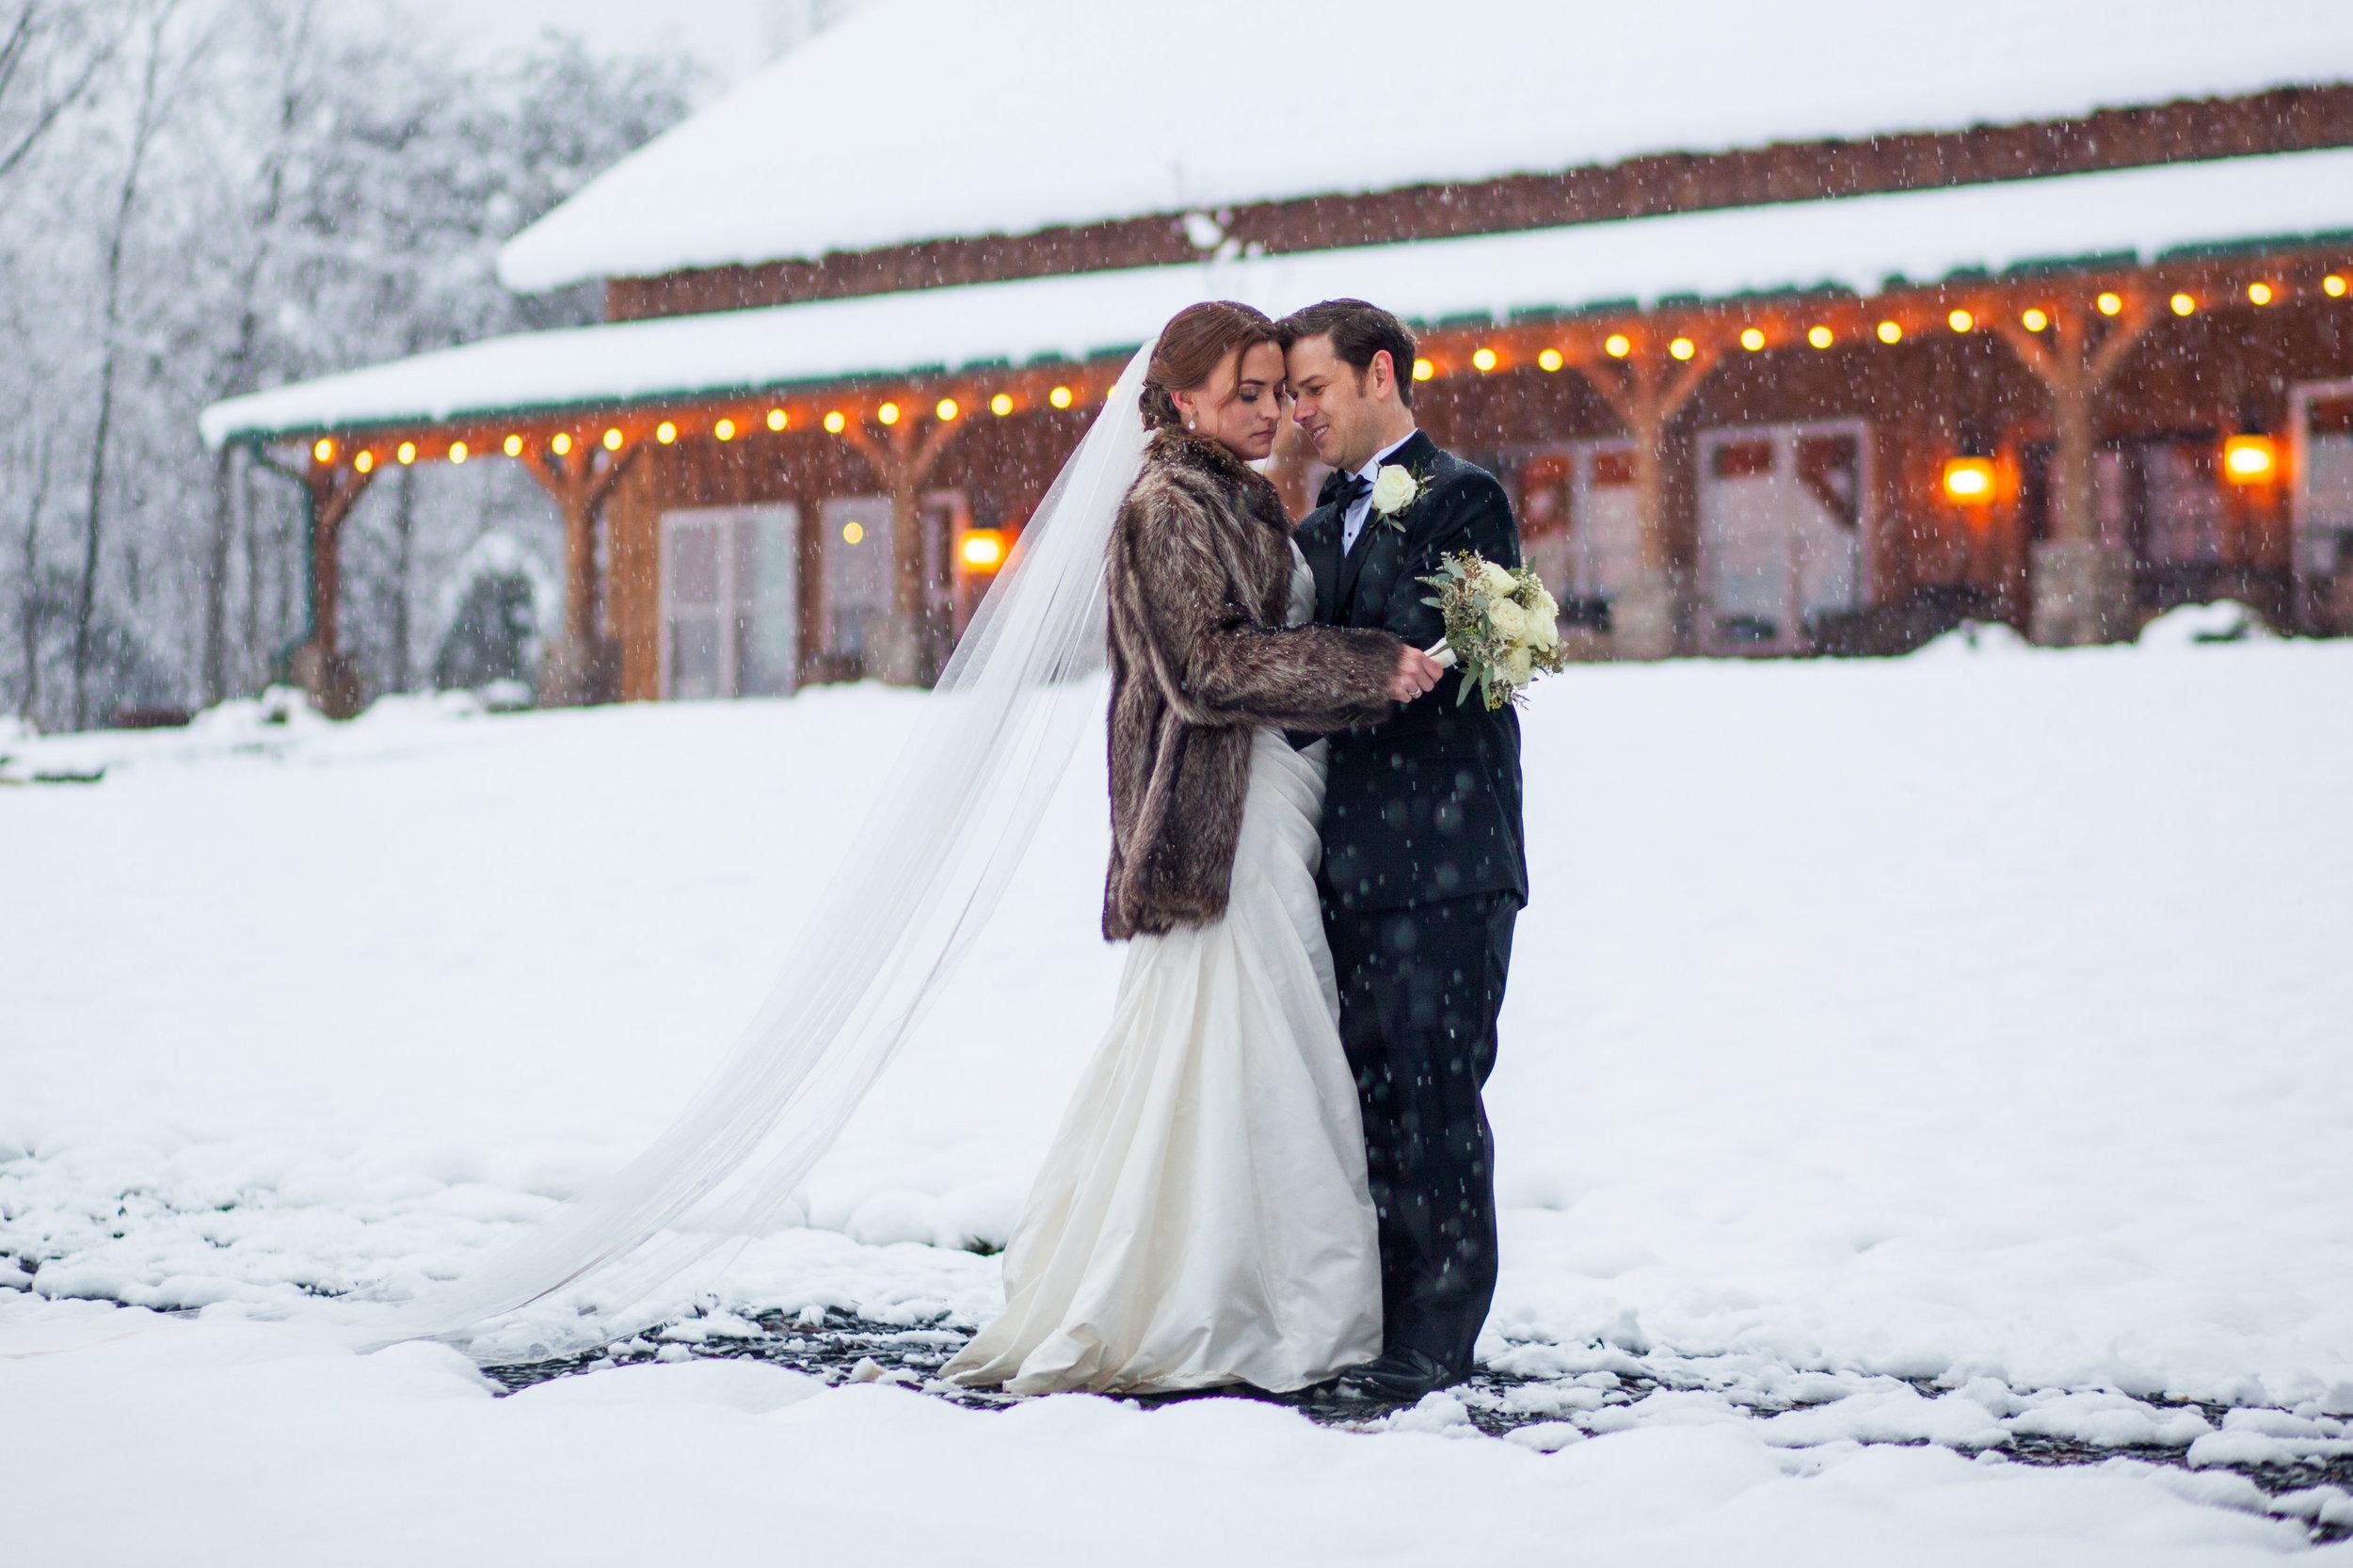 Snowy Winter Wedding -